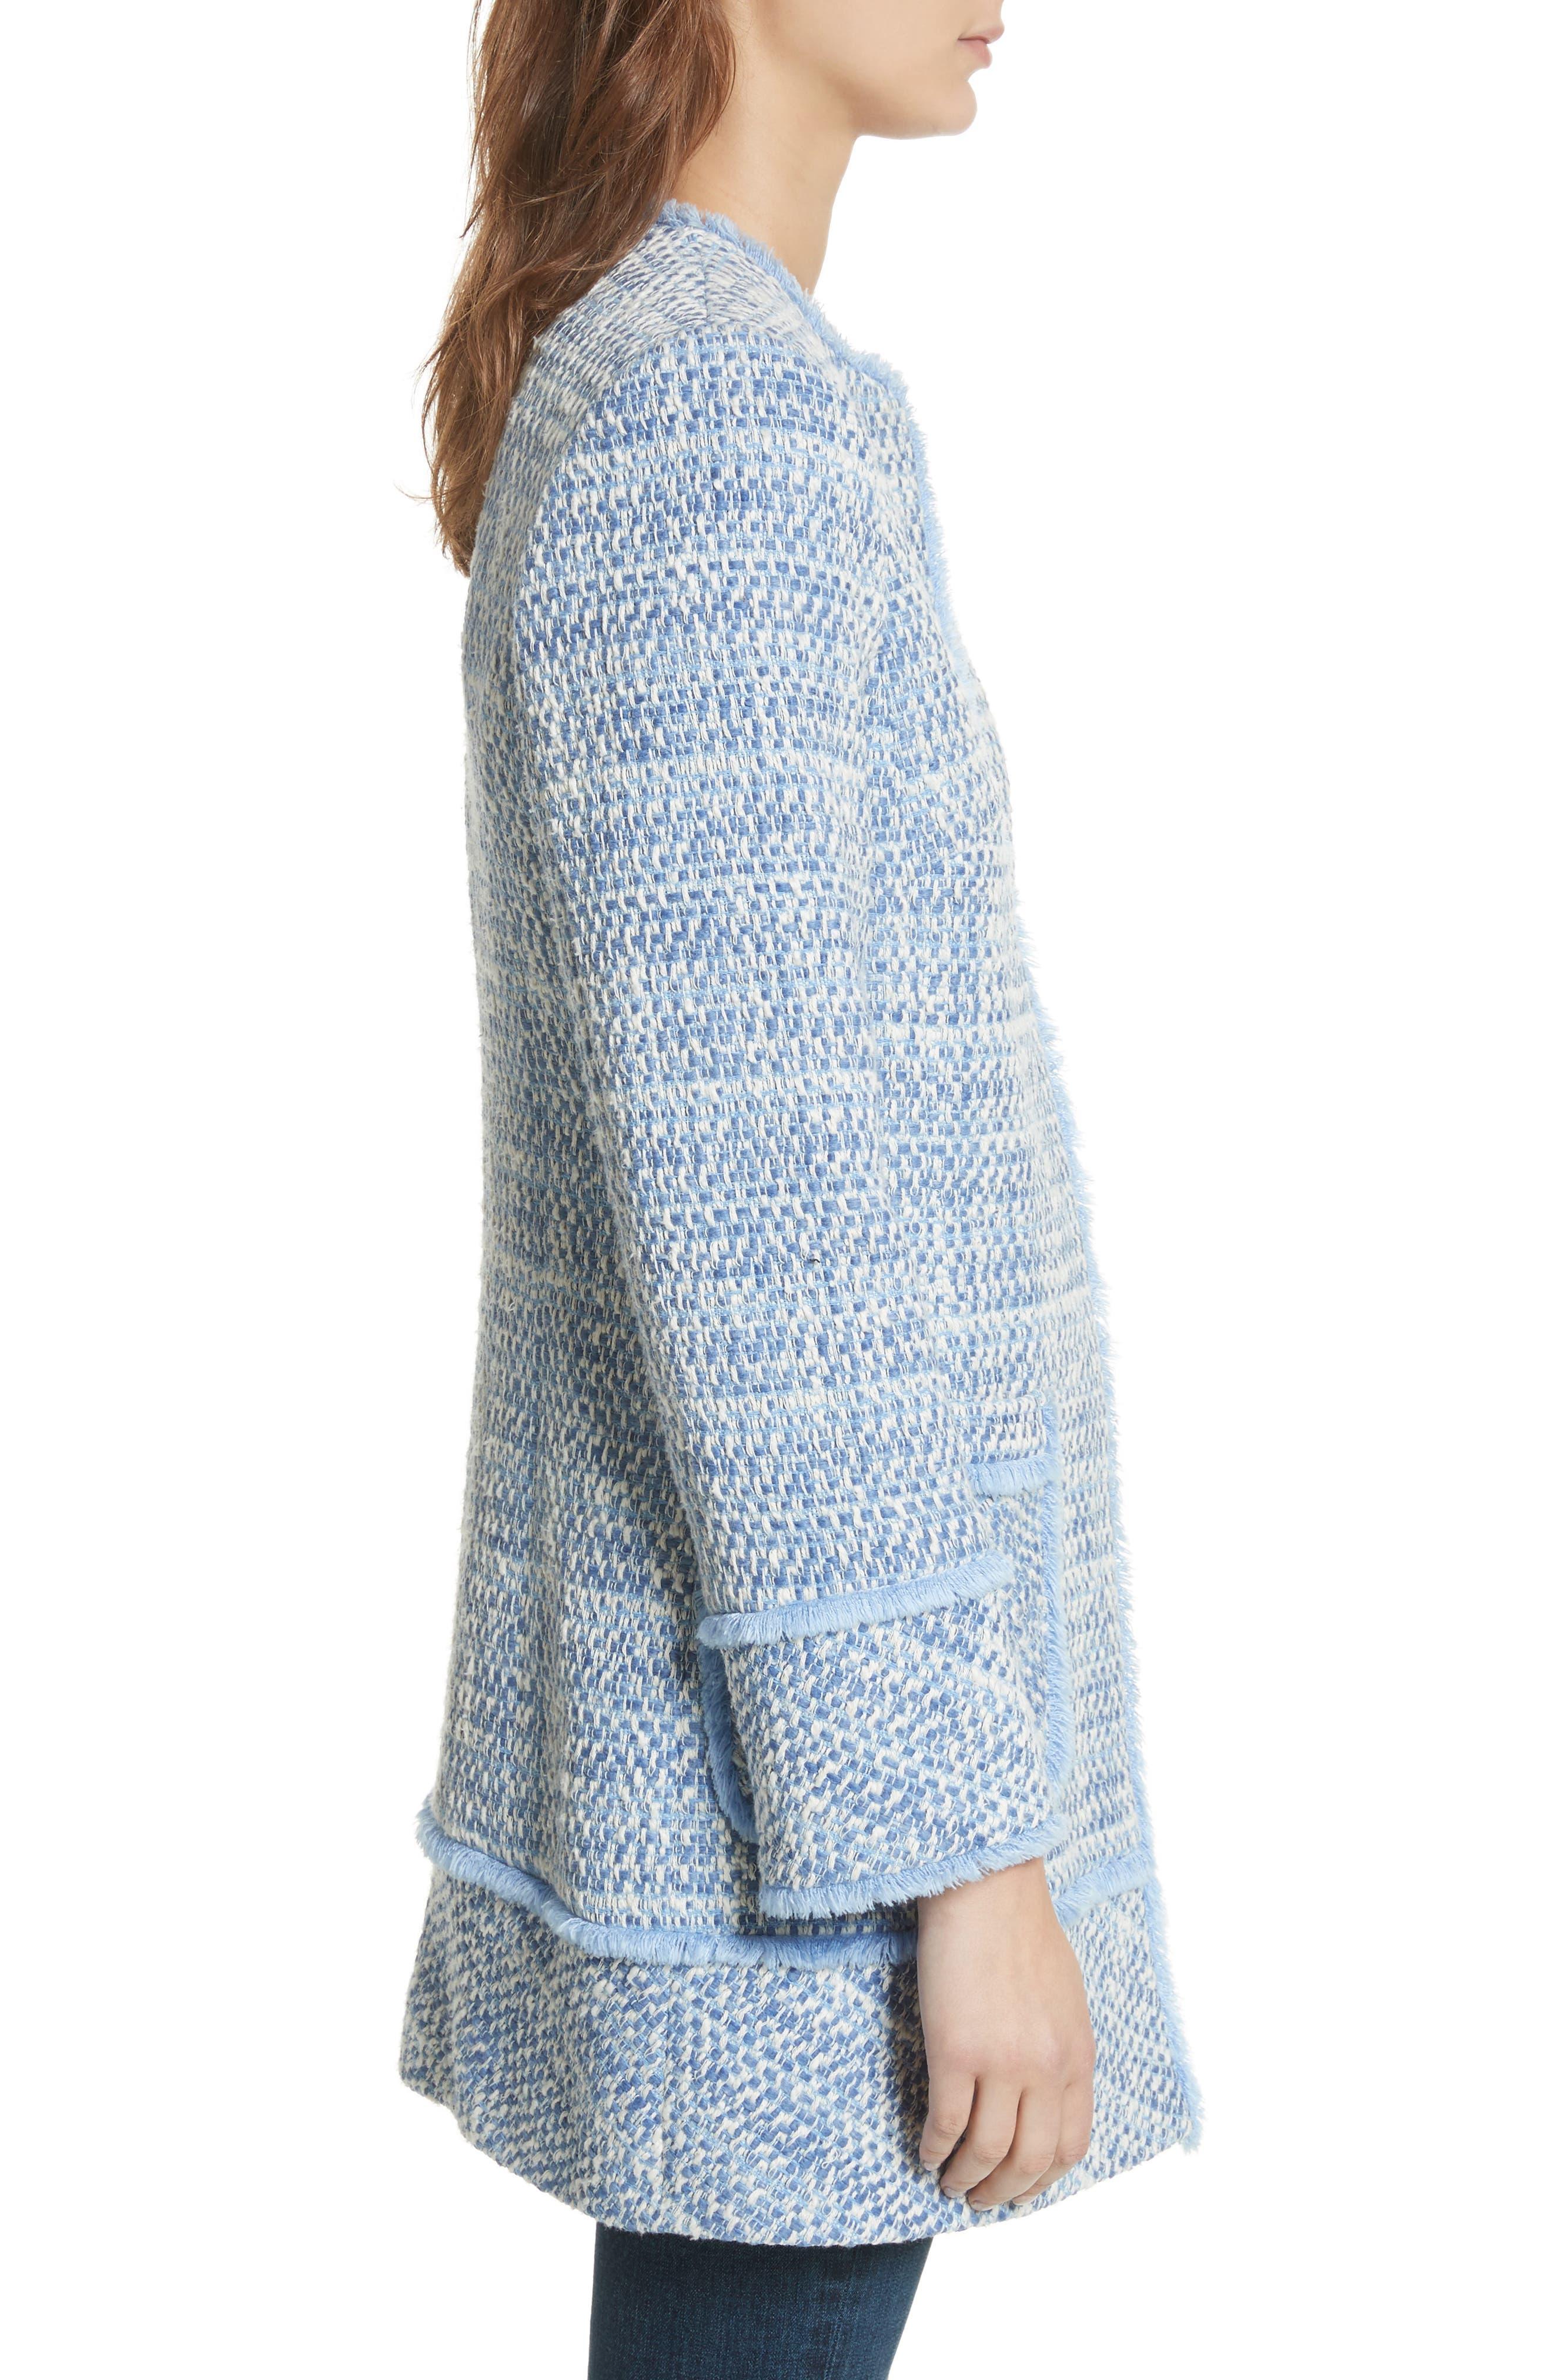 Long Tweed Jacket,                             Alternate thumbnail 3, color,                             Pale Blue